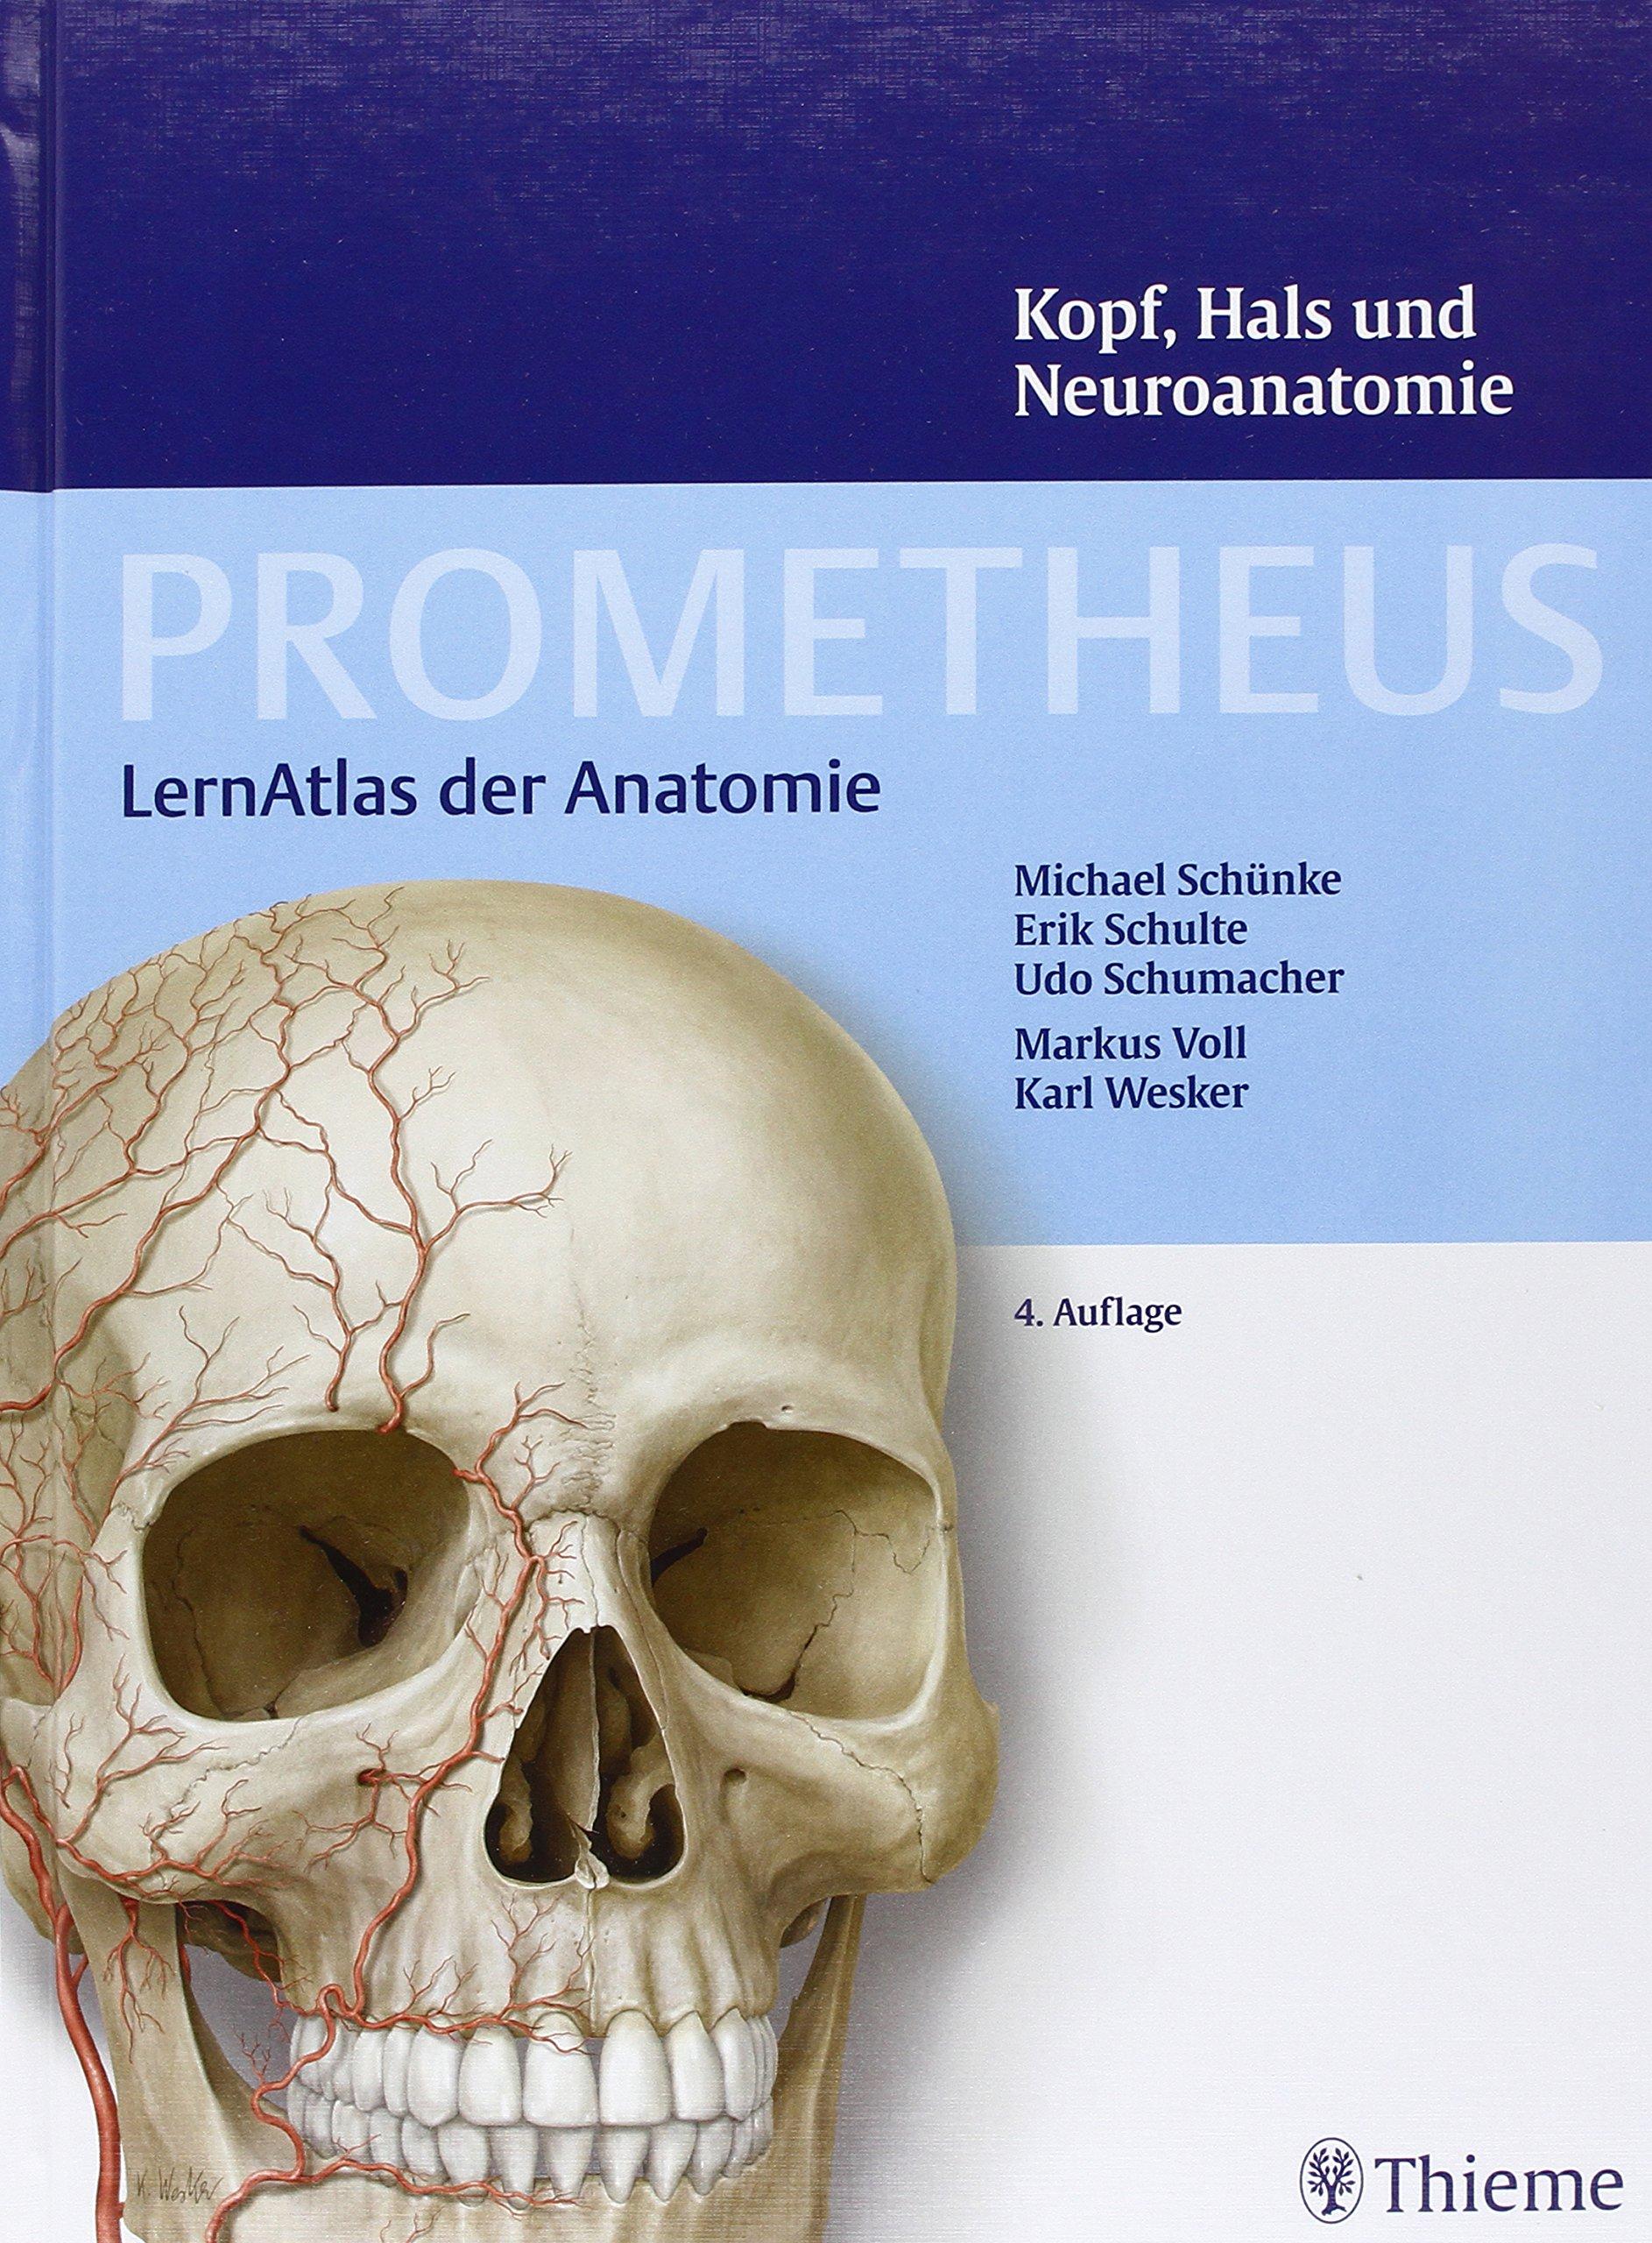 PROMETHEUS LernPaket Anatomie: LernAtlas Anatomie: Amazon.de: Erik ...